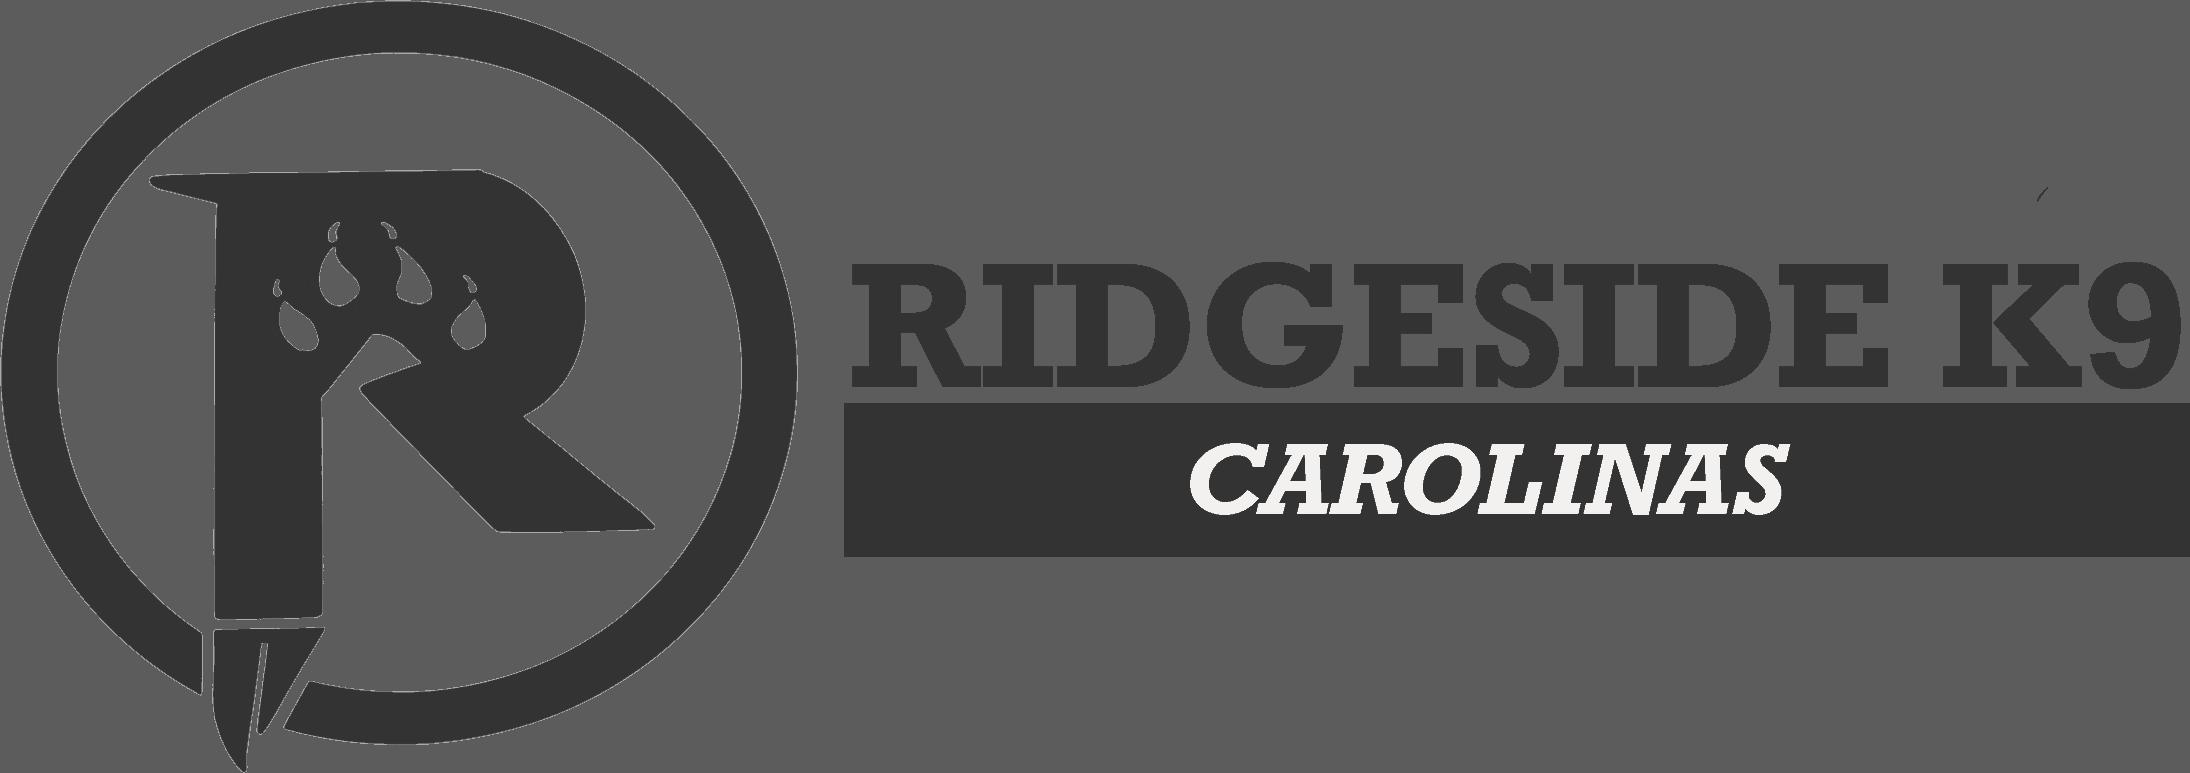 Rideside K9 North Carolina